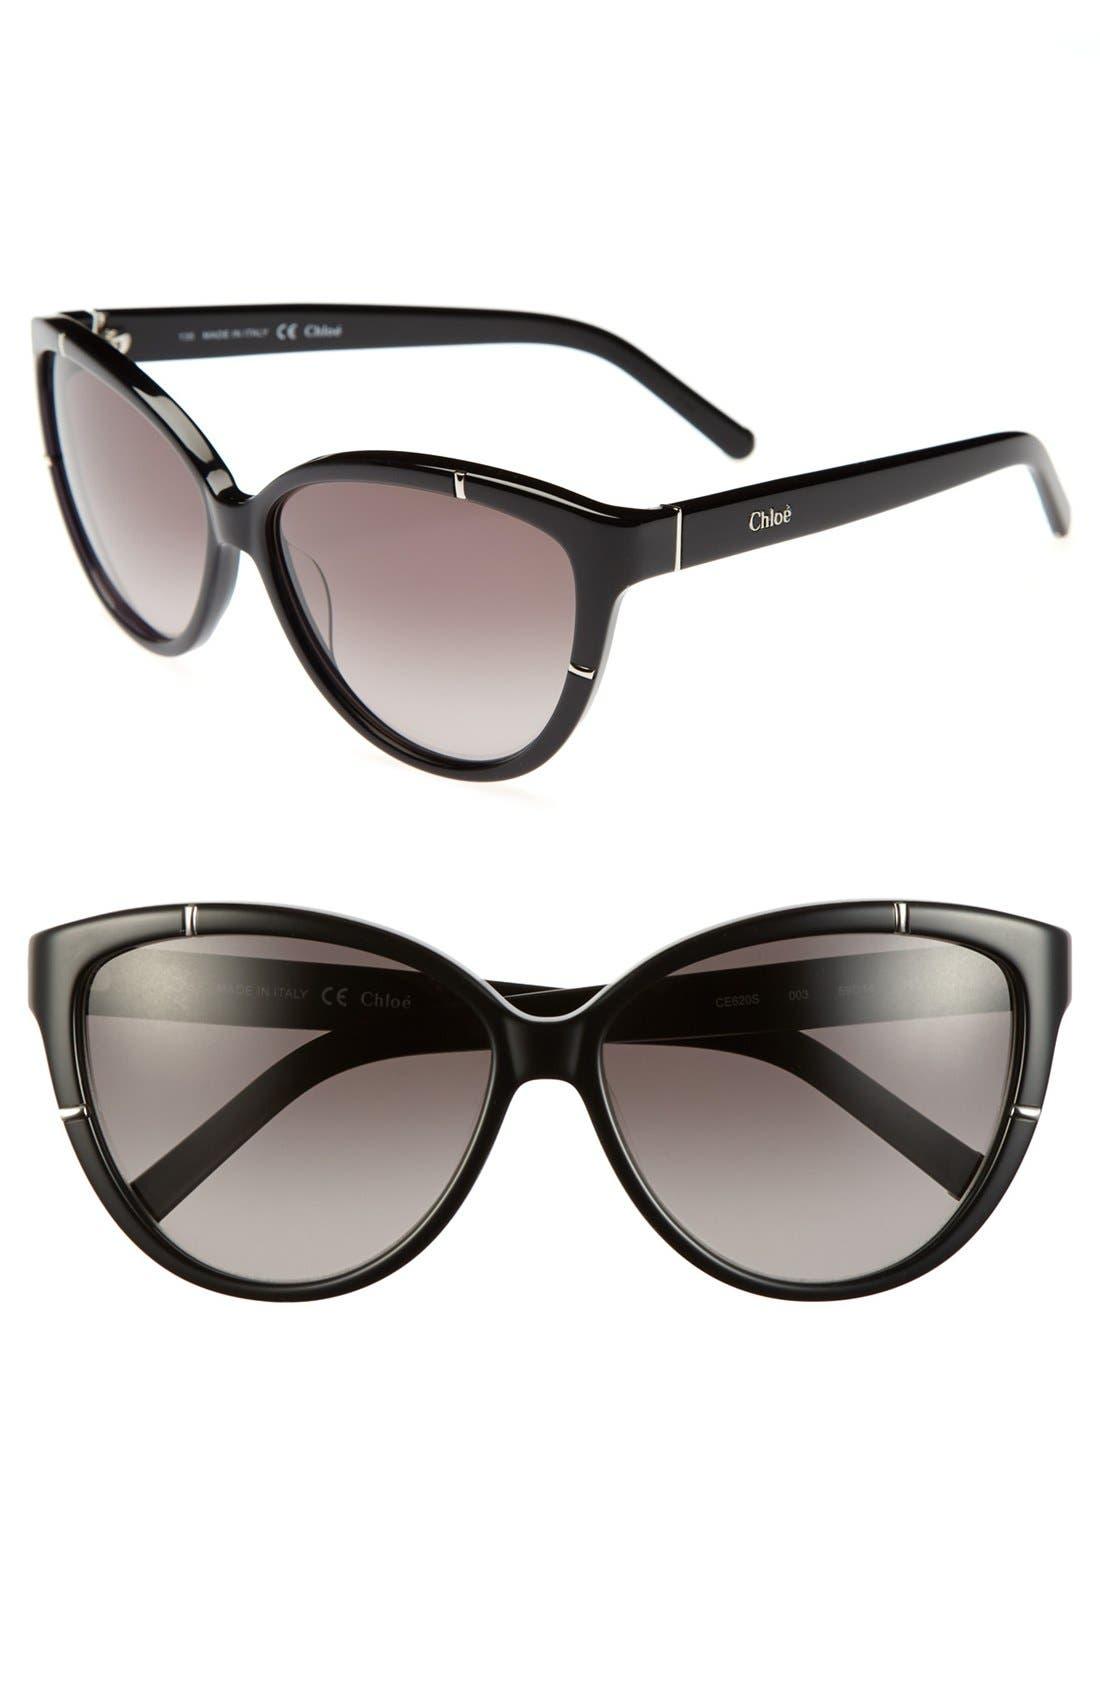 Main Image - Chloé 'Caspia' 59mm Sunglasses